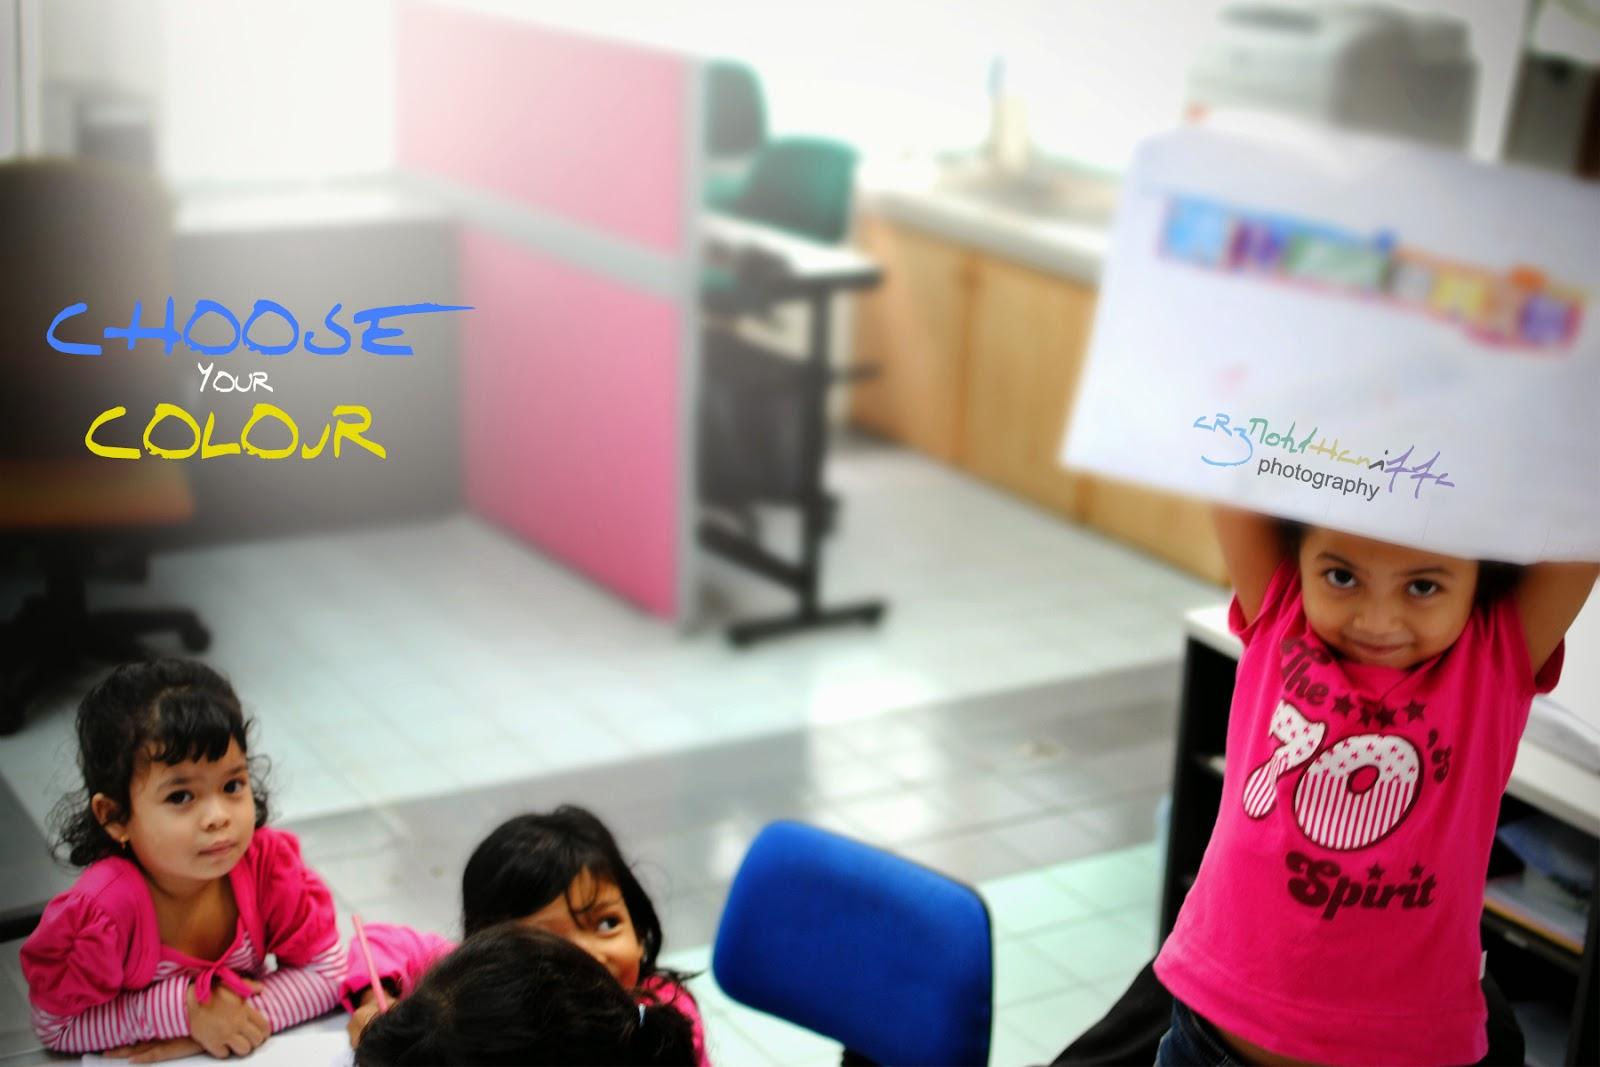 Colour, kids, choose your colour, kids world, gambar cantik, photography